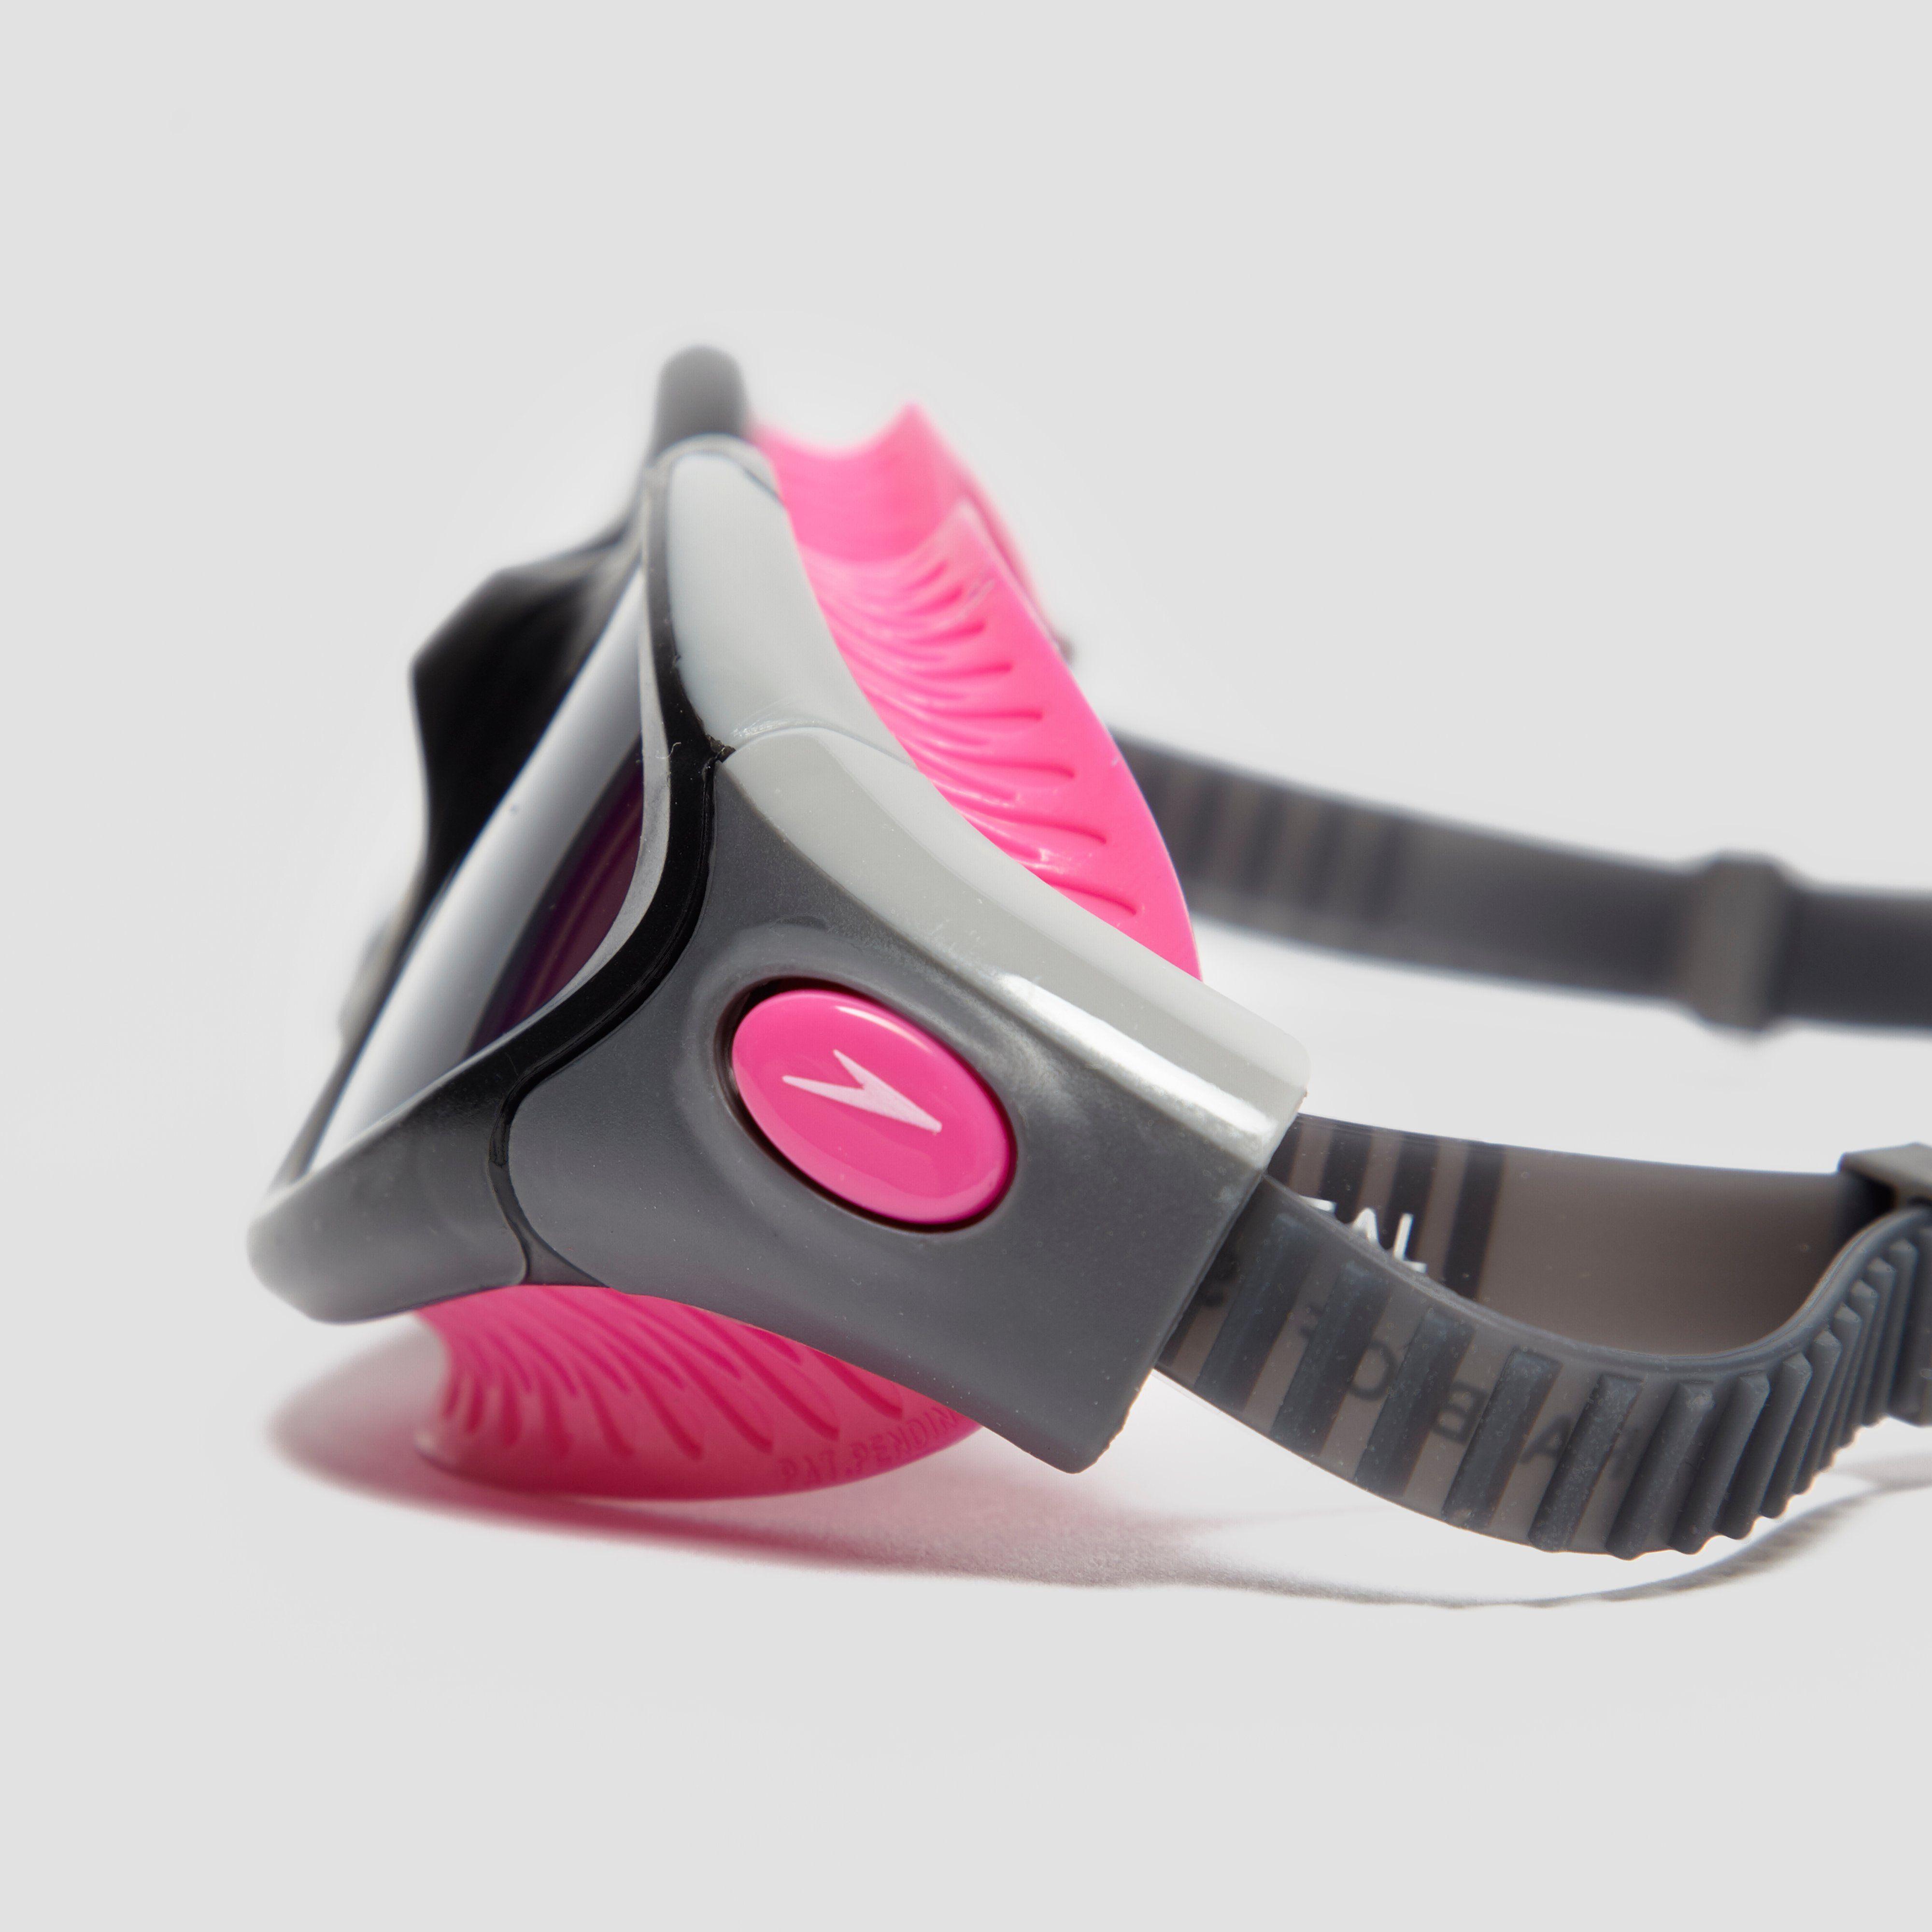 Speedo Futura Biofuse Flexiseal Women's Swimming Goggles